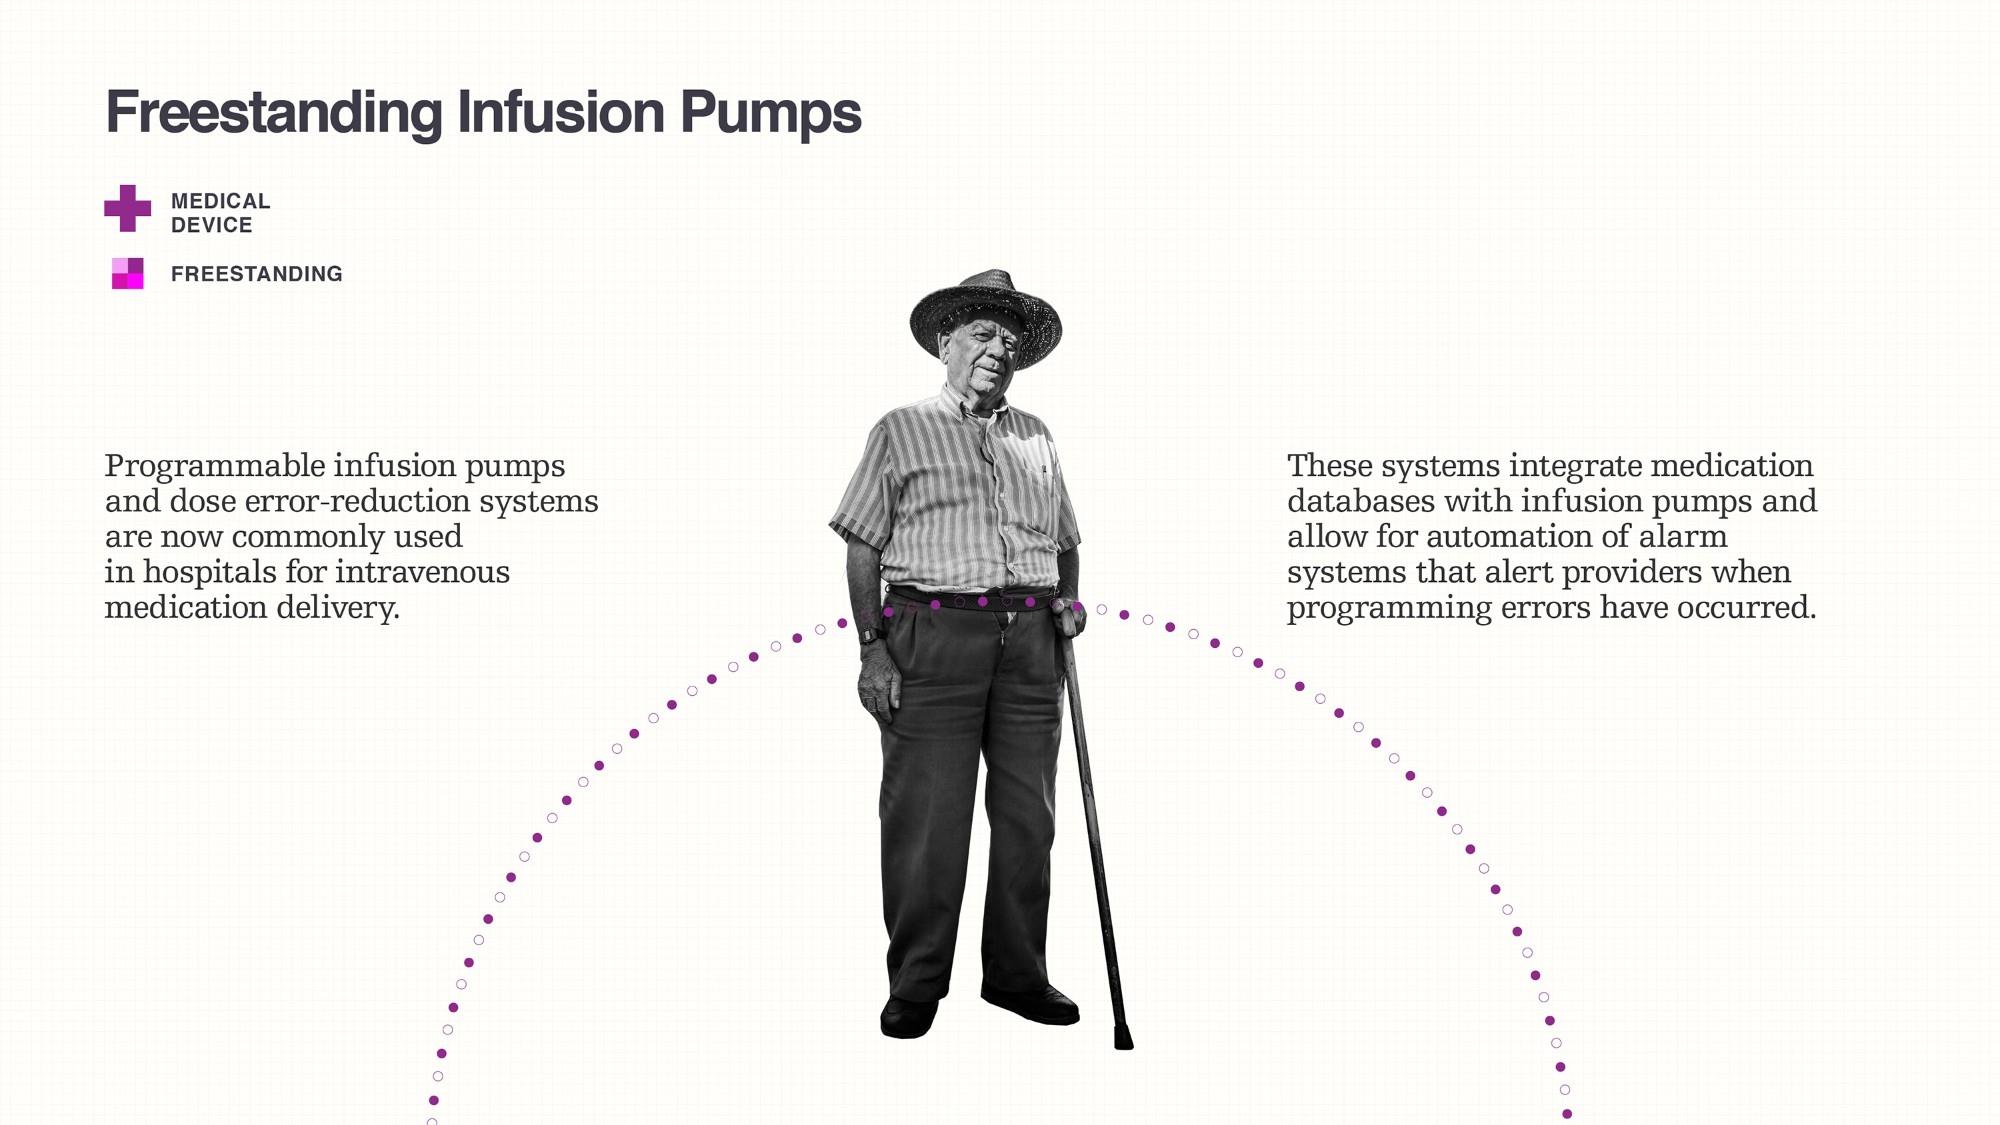 Data visualization illustrating freestanding infusion pumps by Gioriga Lupi.